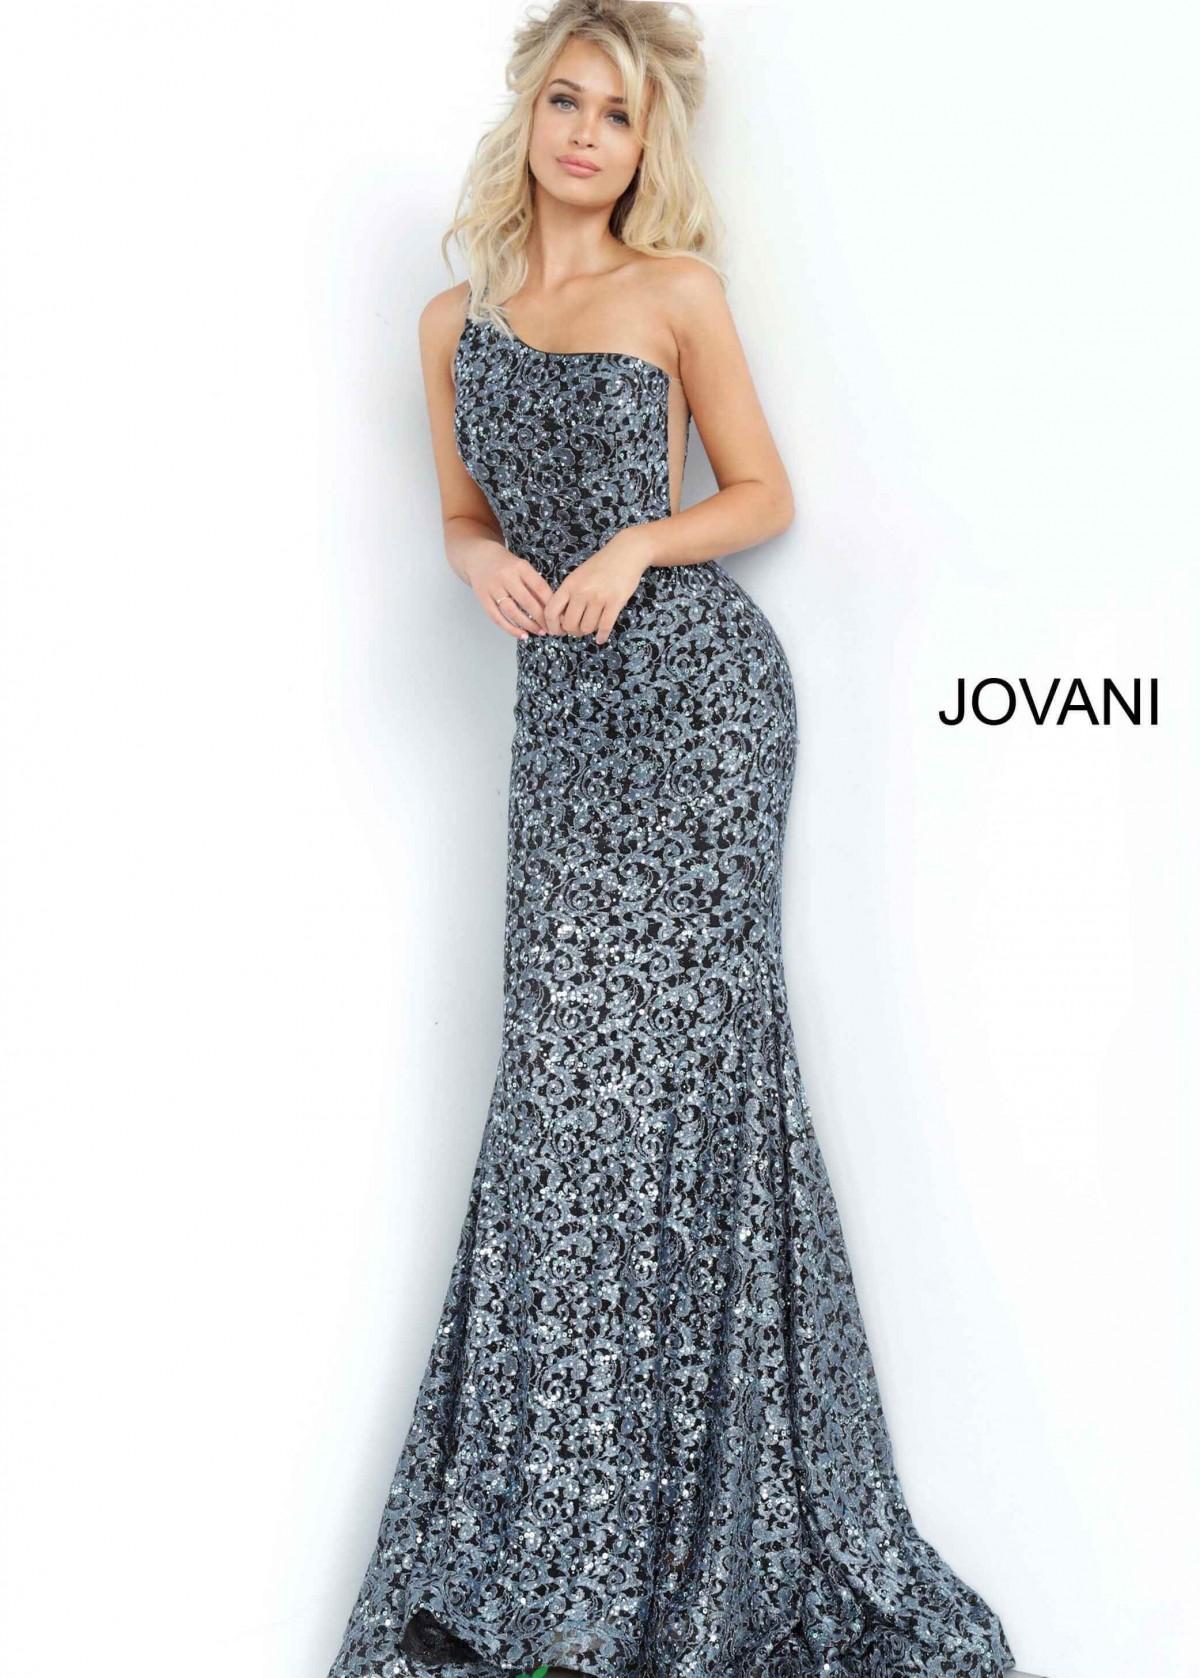 Jovani Black and Silver Dress